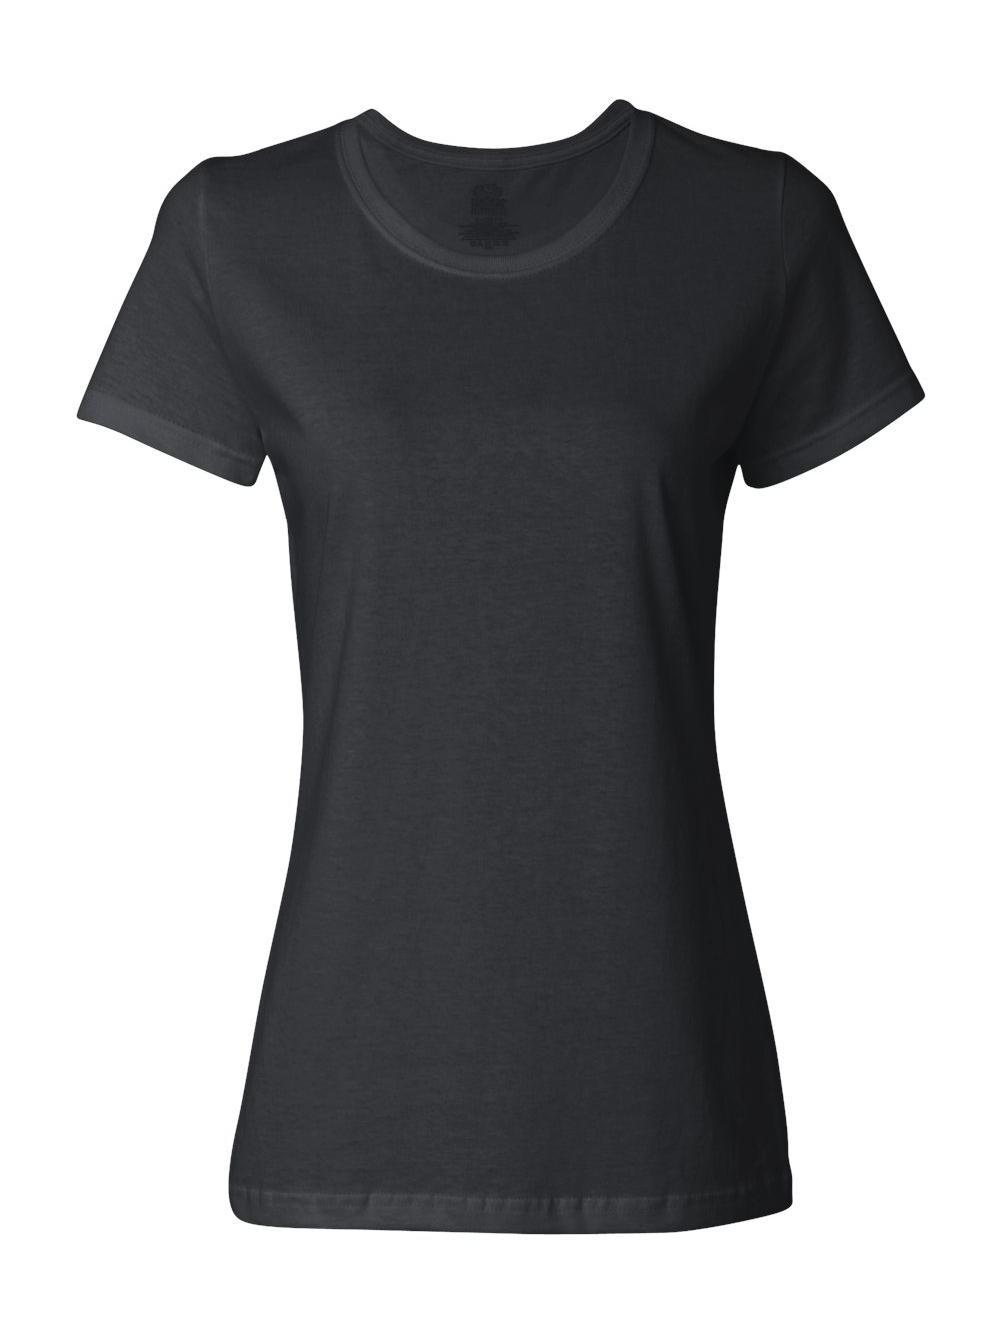 Fruit-of-the-Loom-HD-Cotton-Women-039-s-Short-Sleeve-T-Shirt-L3930R thumbnail 6